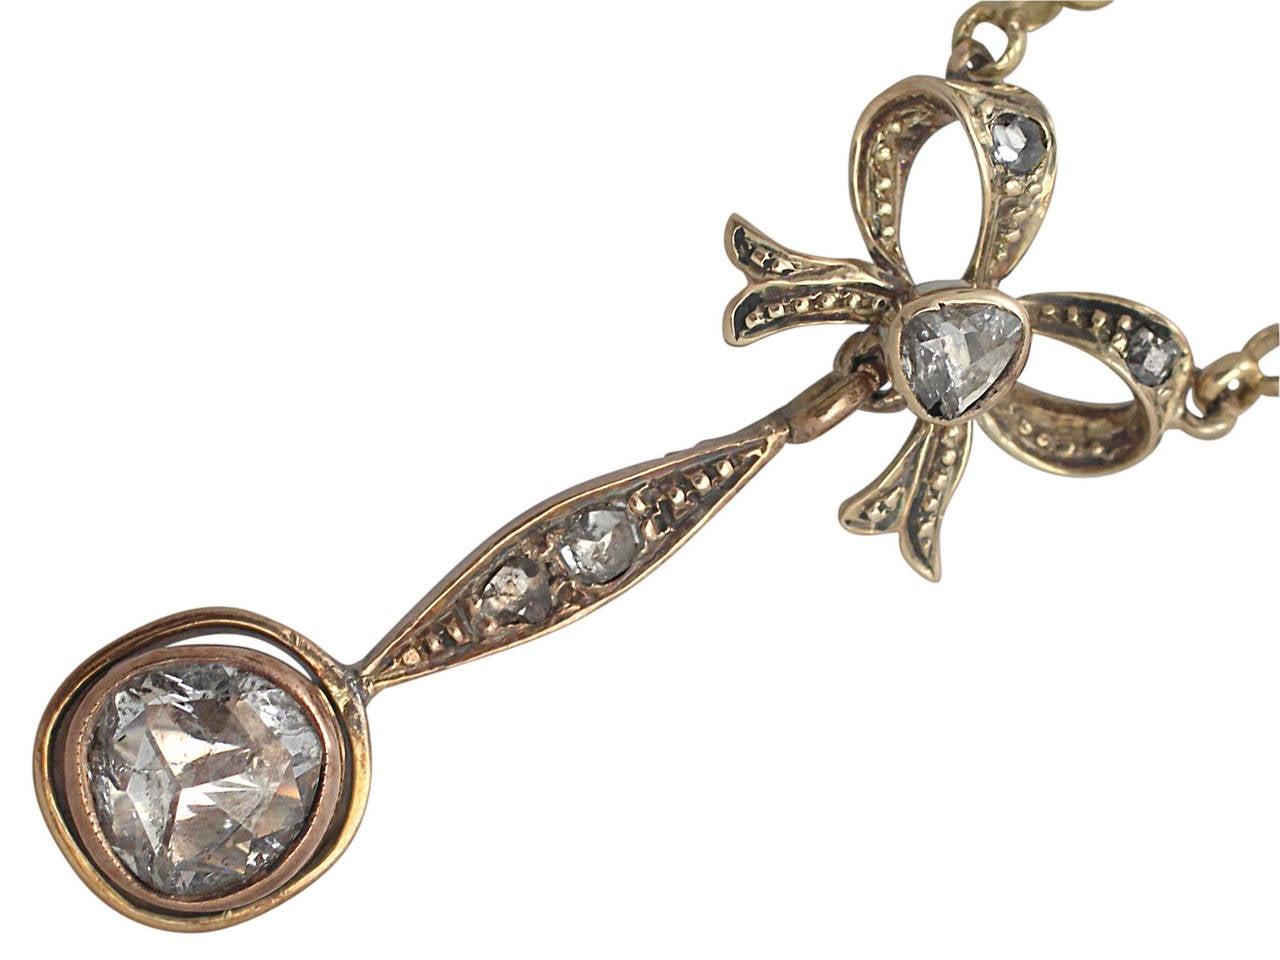 1.15Ct Diamond, 14k Yellow Gold Bow Pendant - Antique French Circa 1910 3